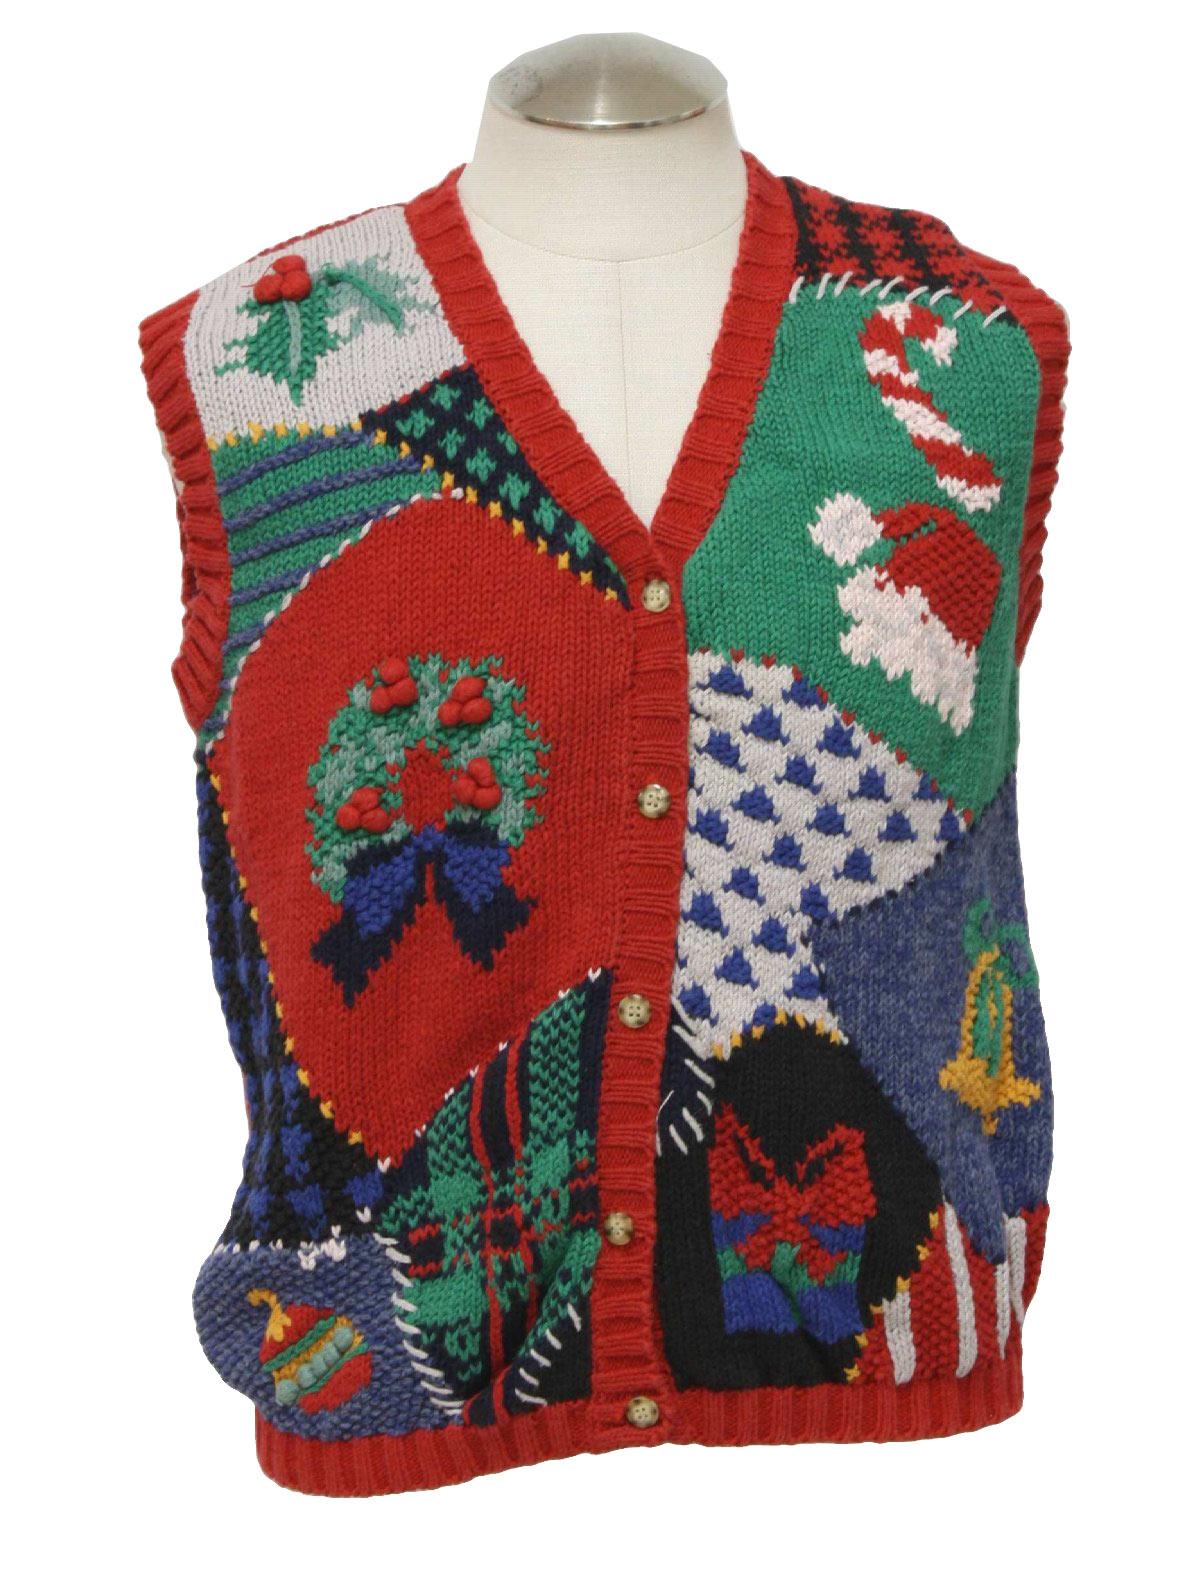 Ugly christmas sweater vest gladys bagley unisex red for Over the top ugly christmas sweaters